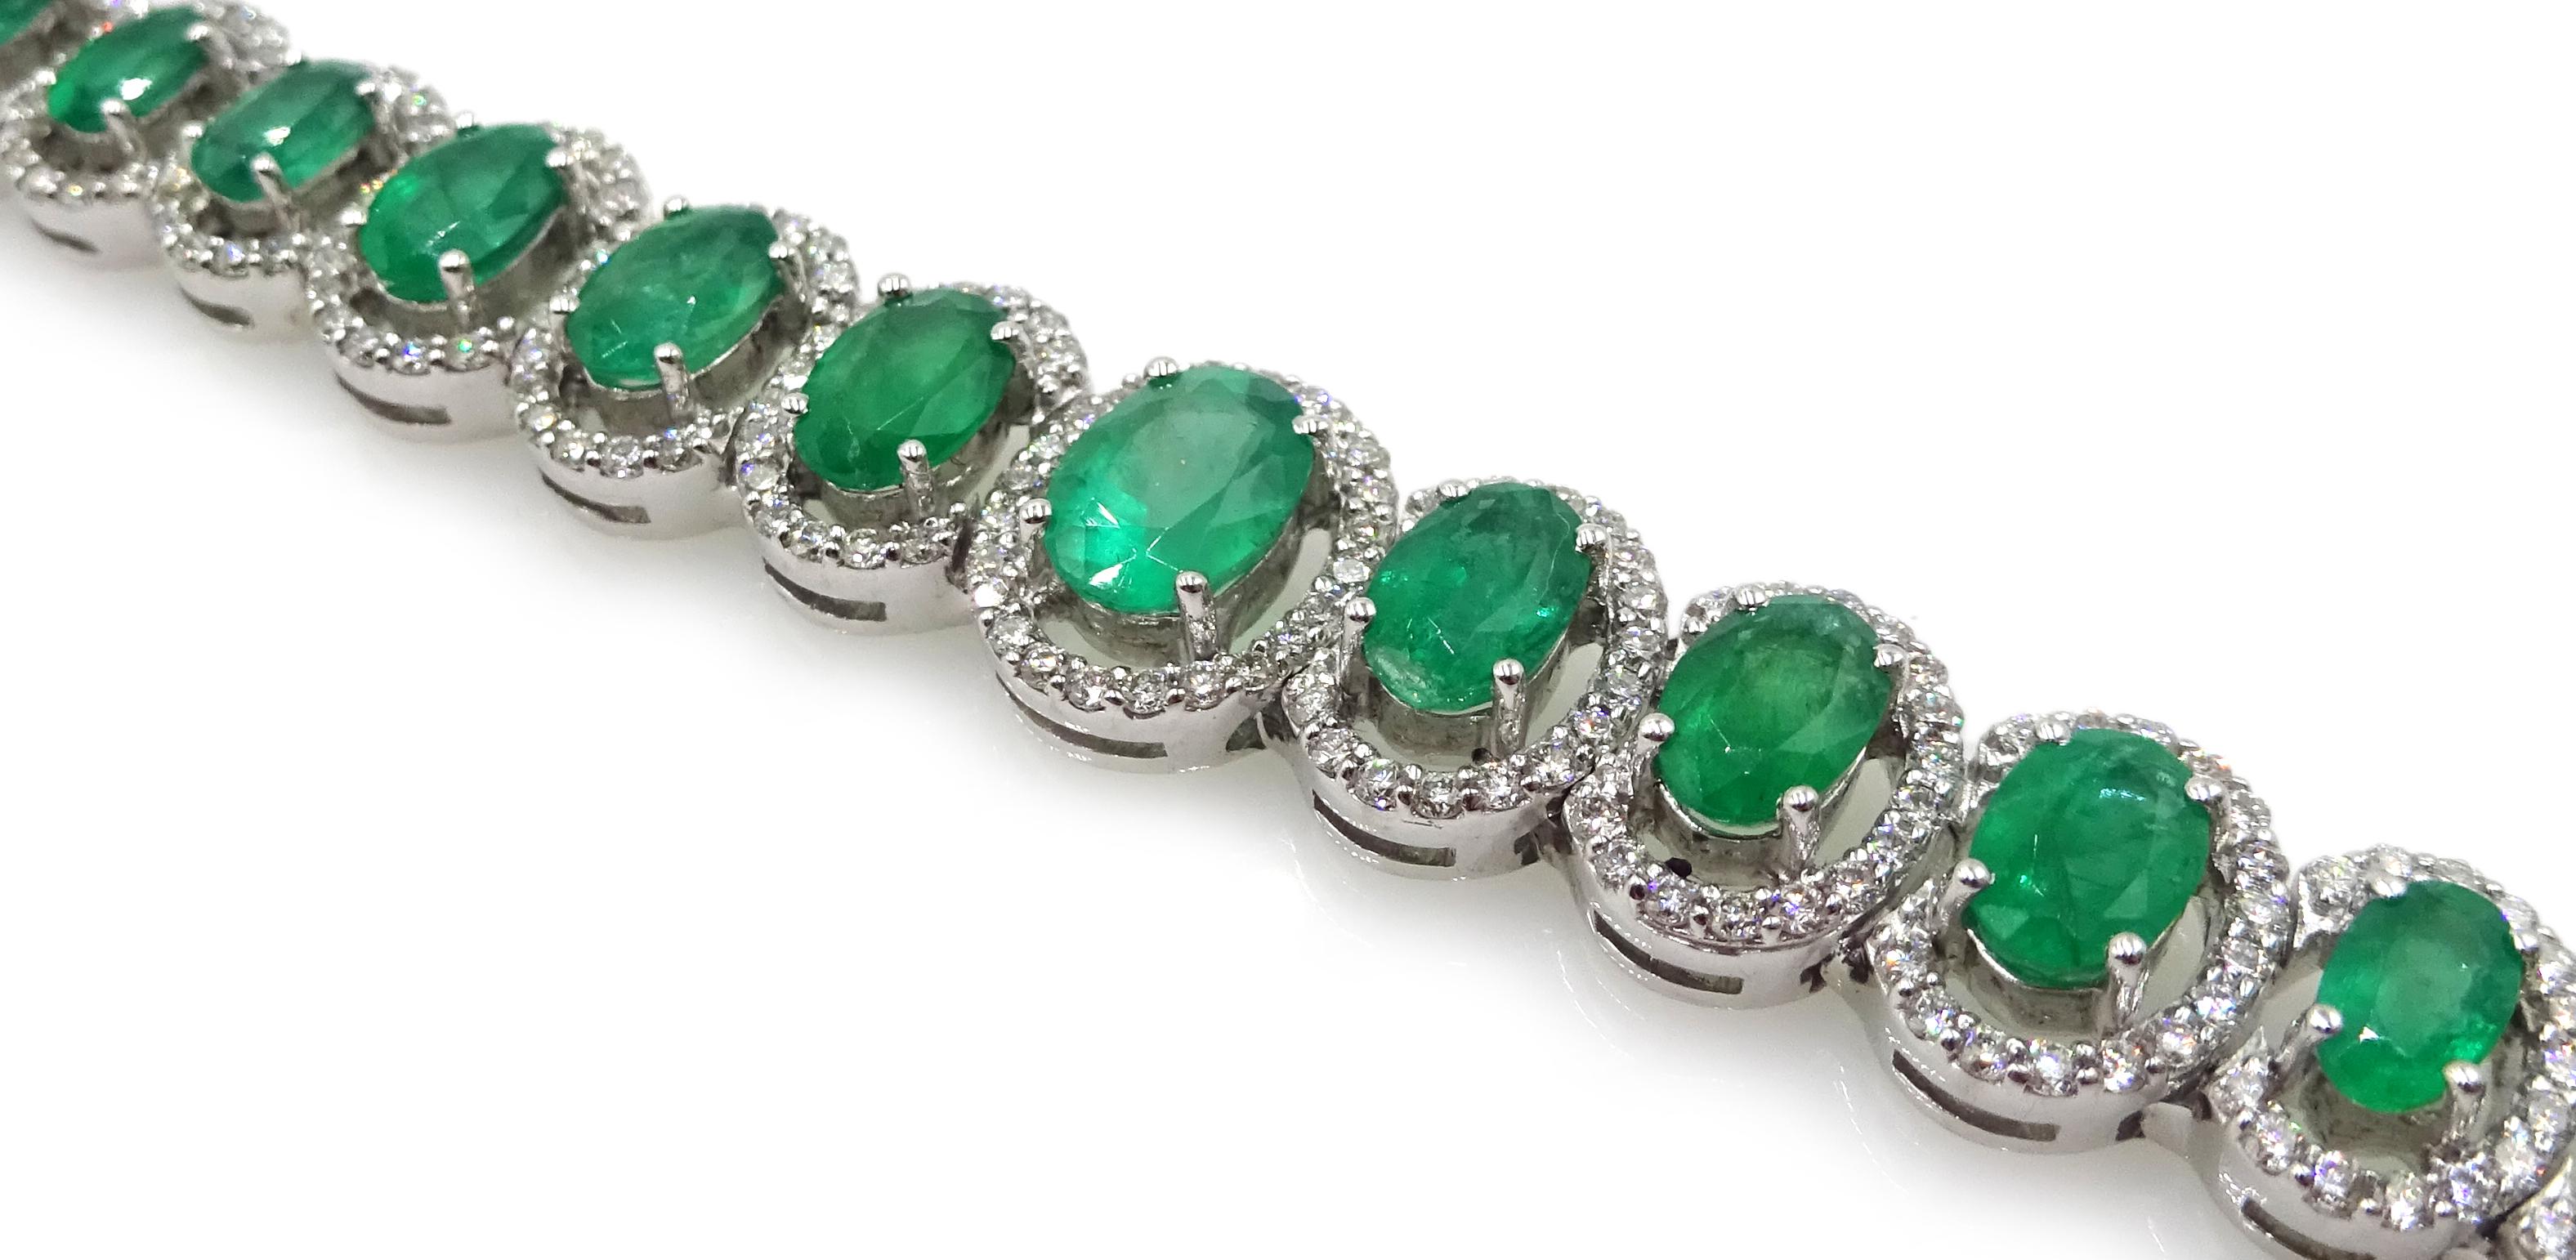 18ct gold graduating oval emerald bracelet - Image 4 of 5